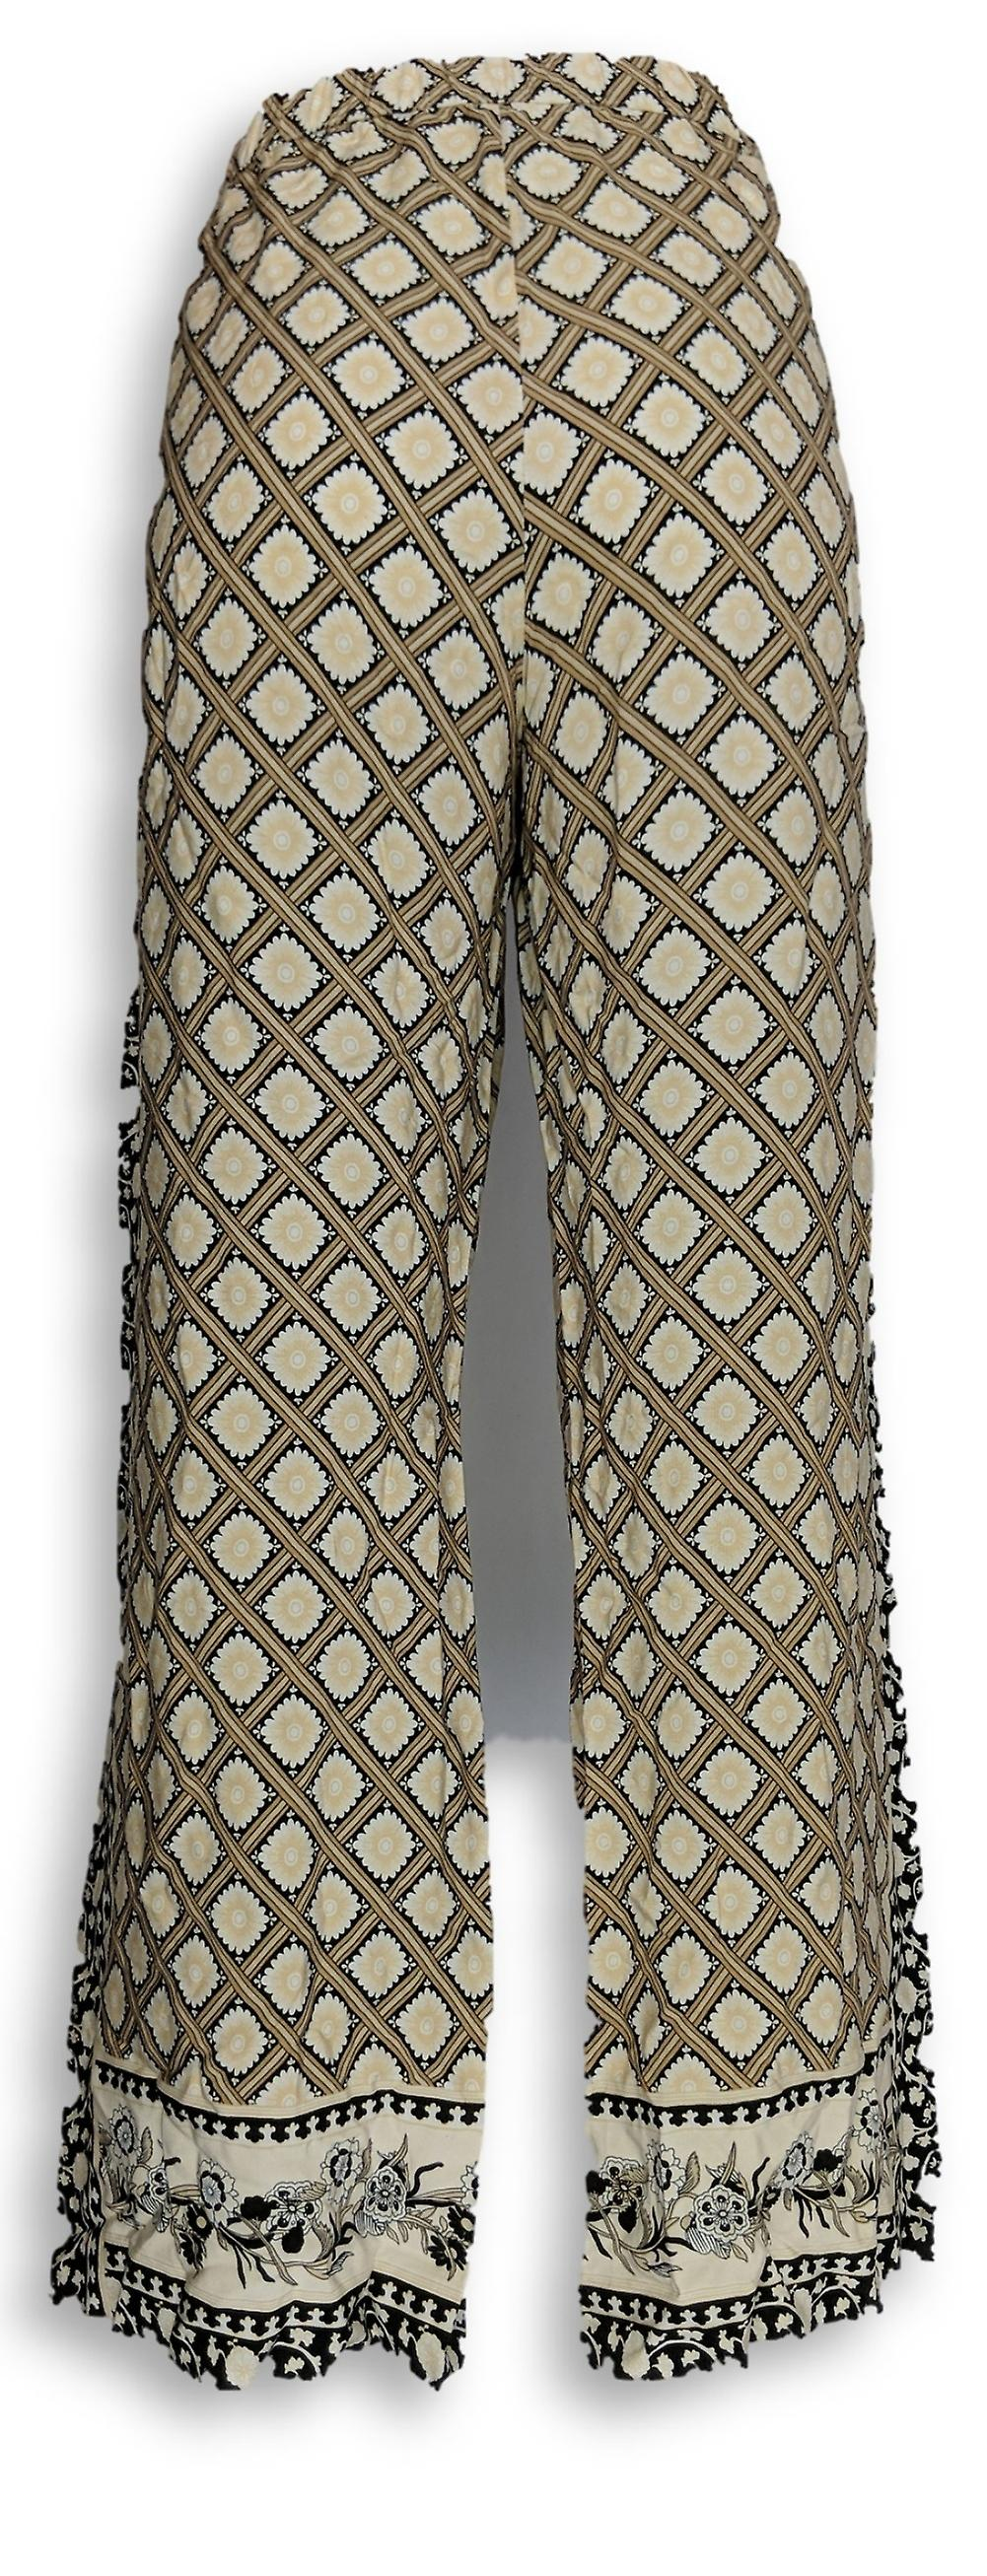 C. Wonder Women's Petite Pants Engineered Print Woven Beige A287462 O4dcI9